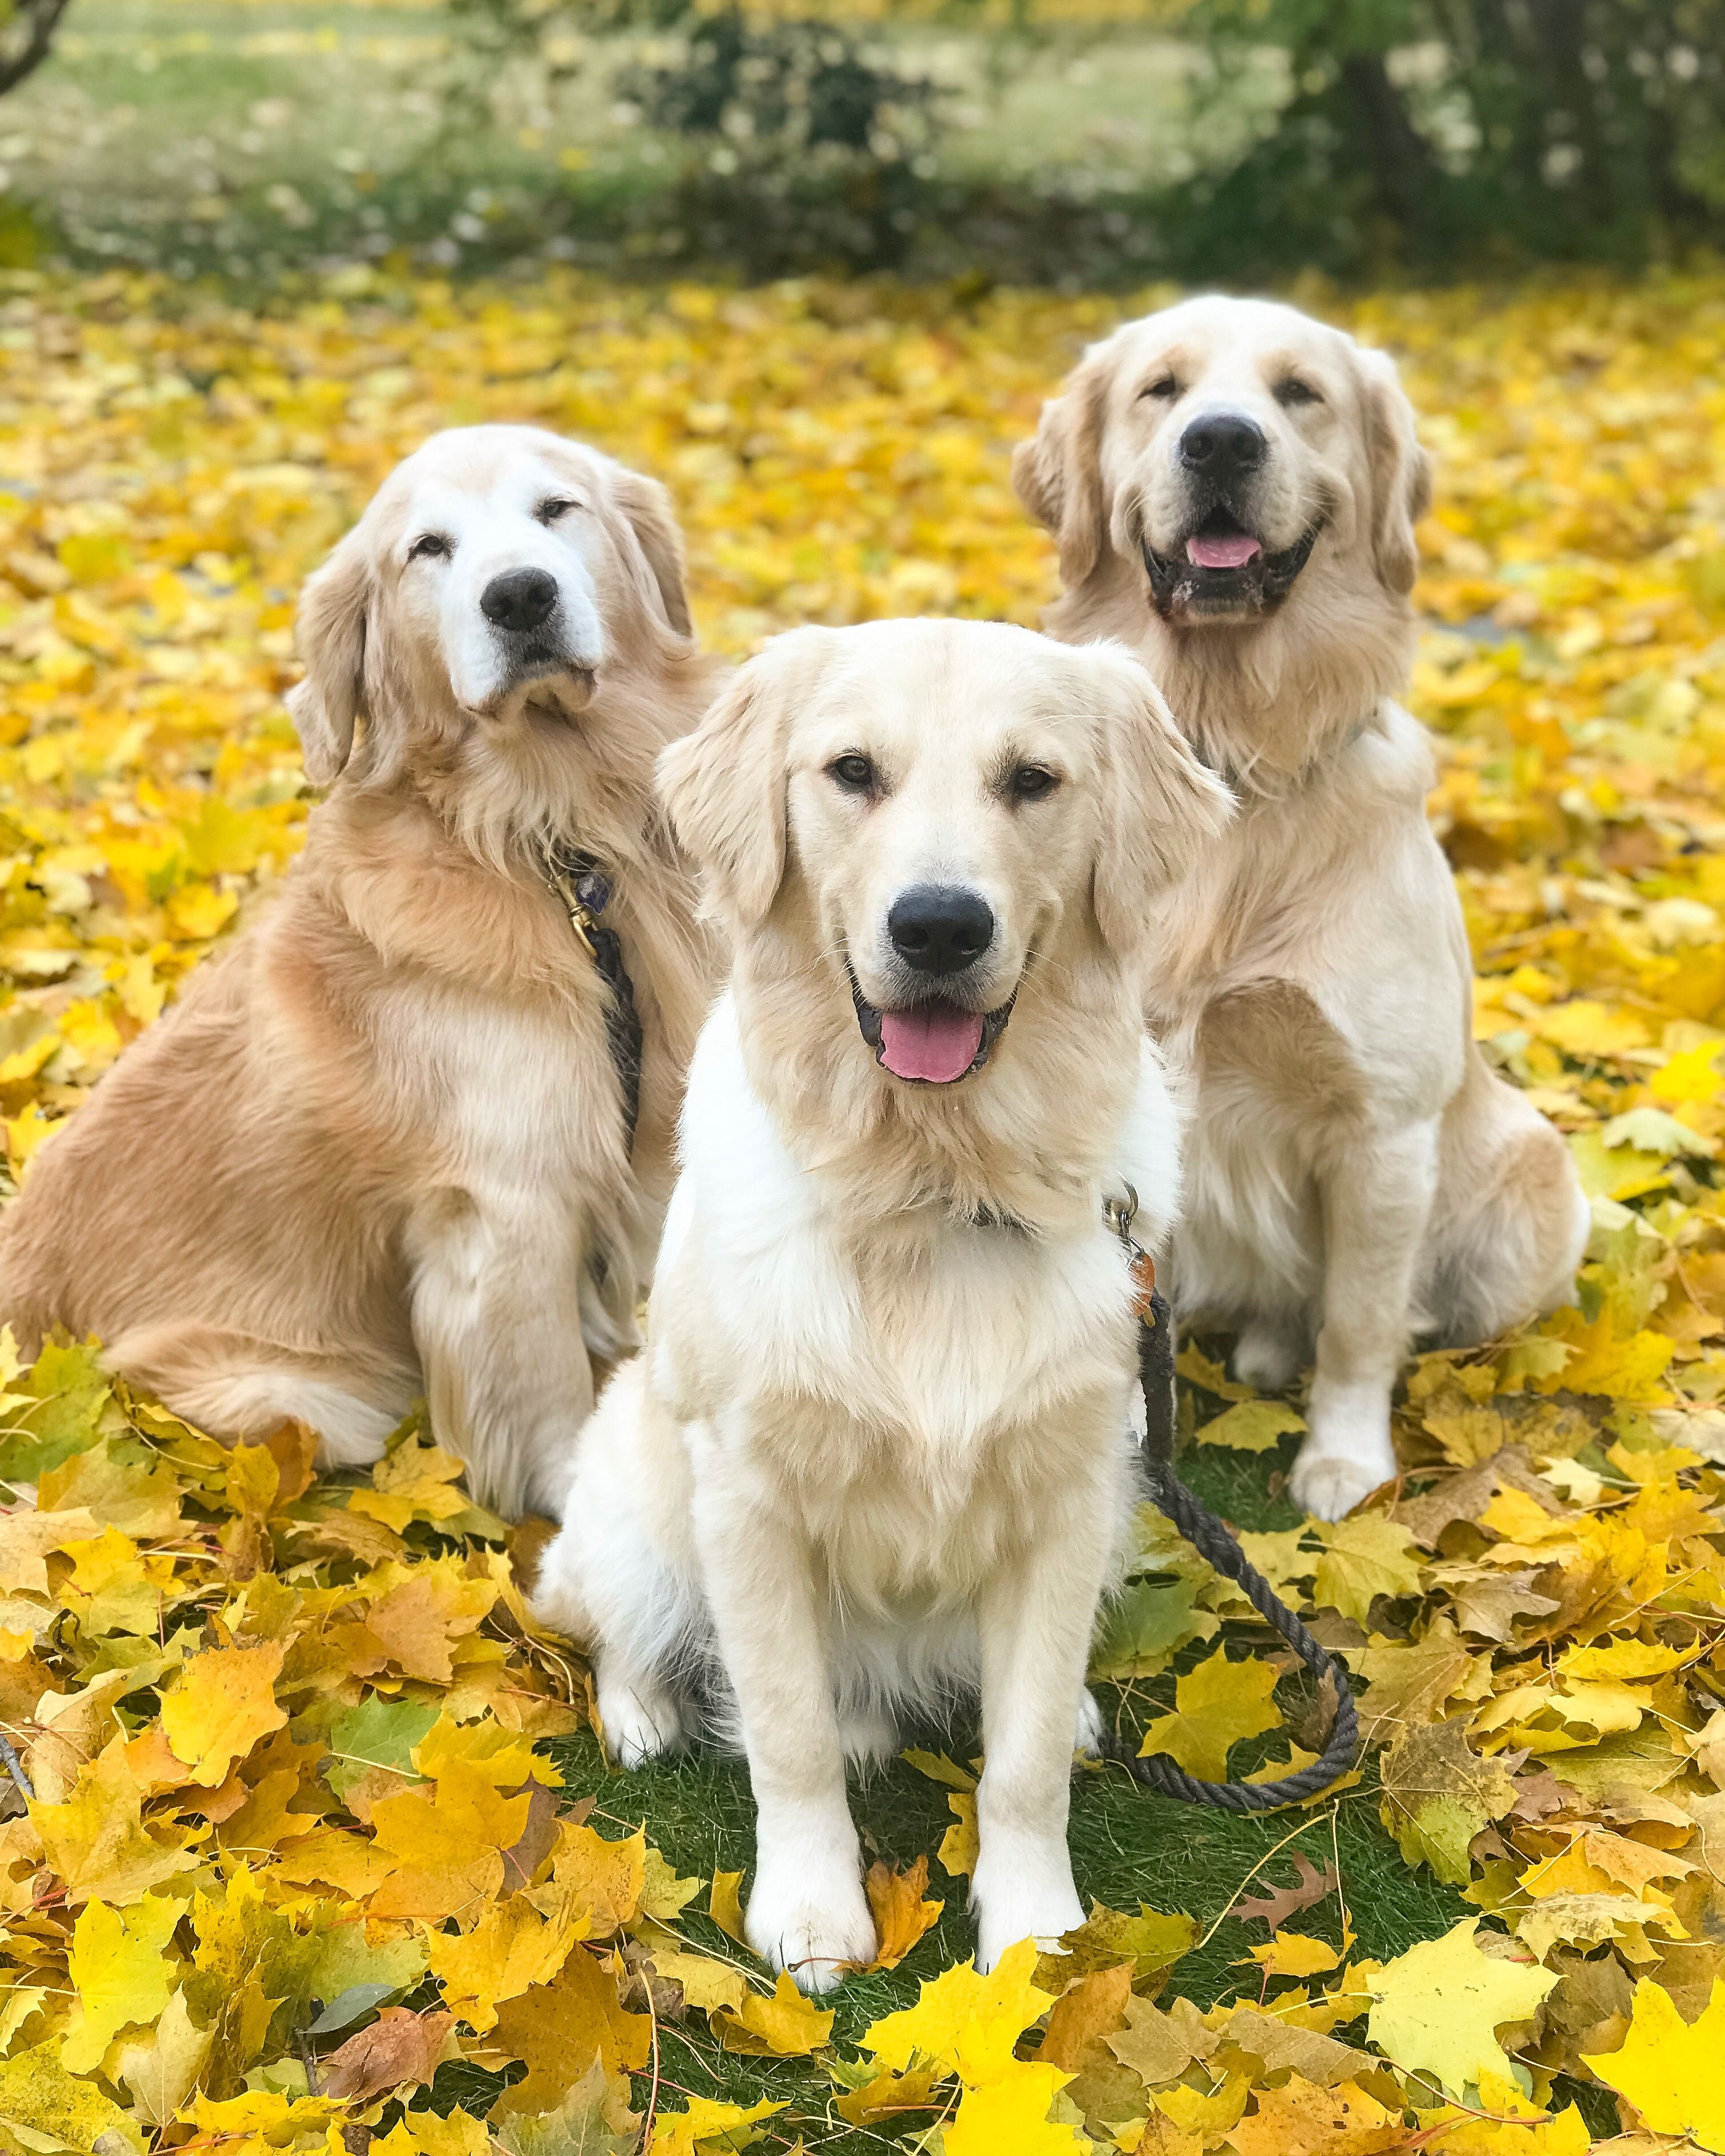 Golden Retriever Father Puppa Tavish With His Sons Joyful Jax